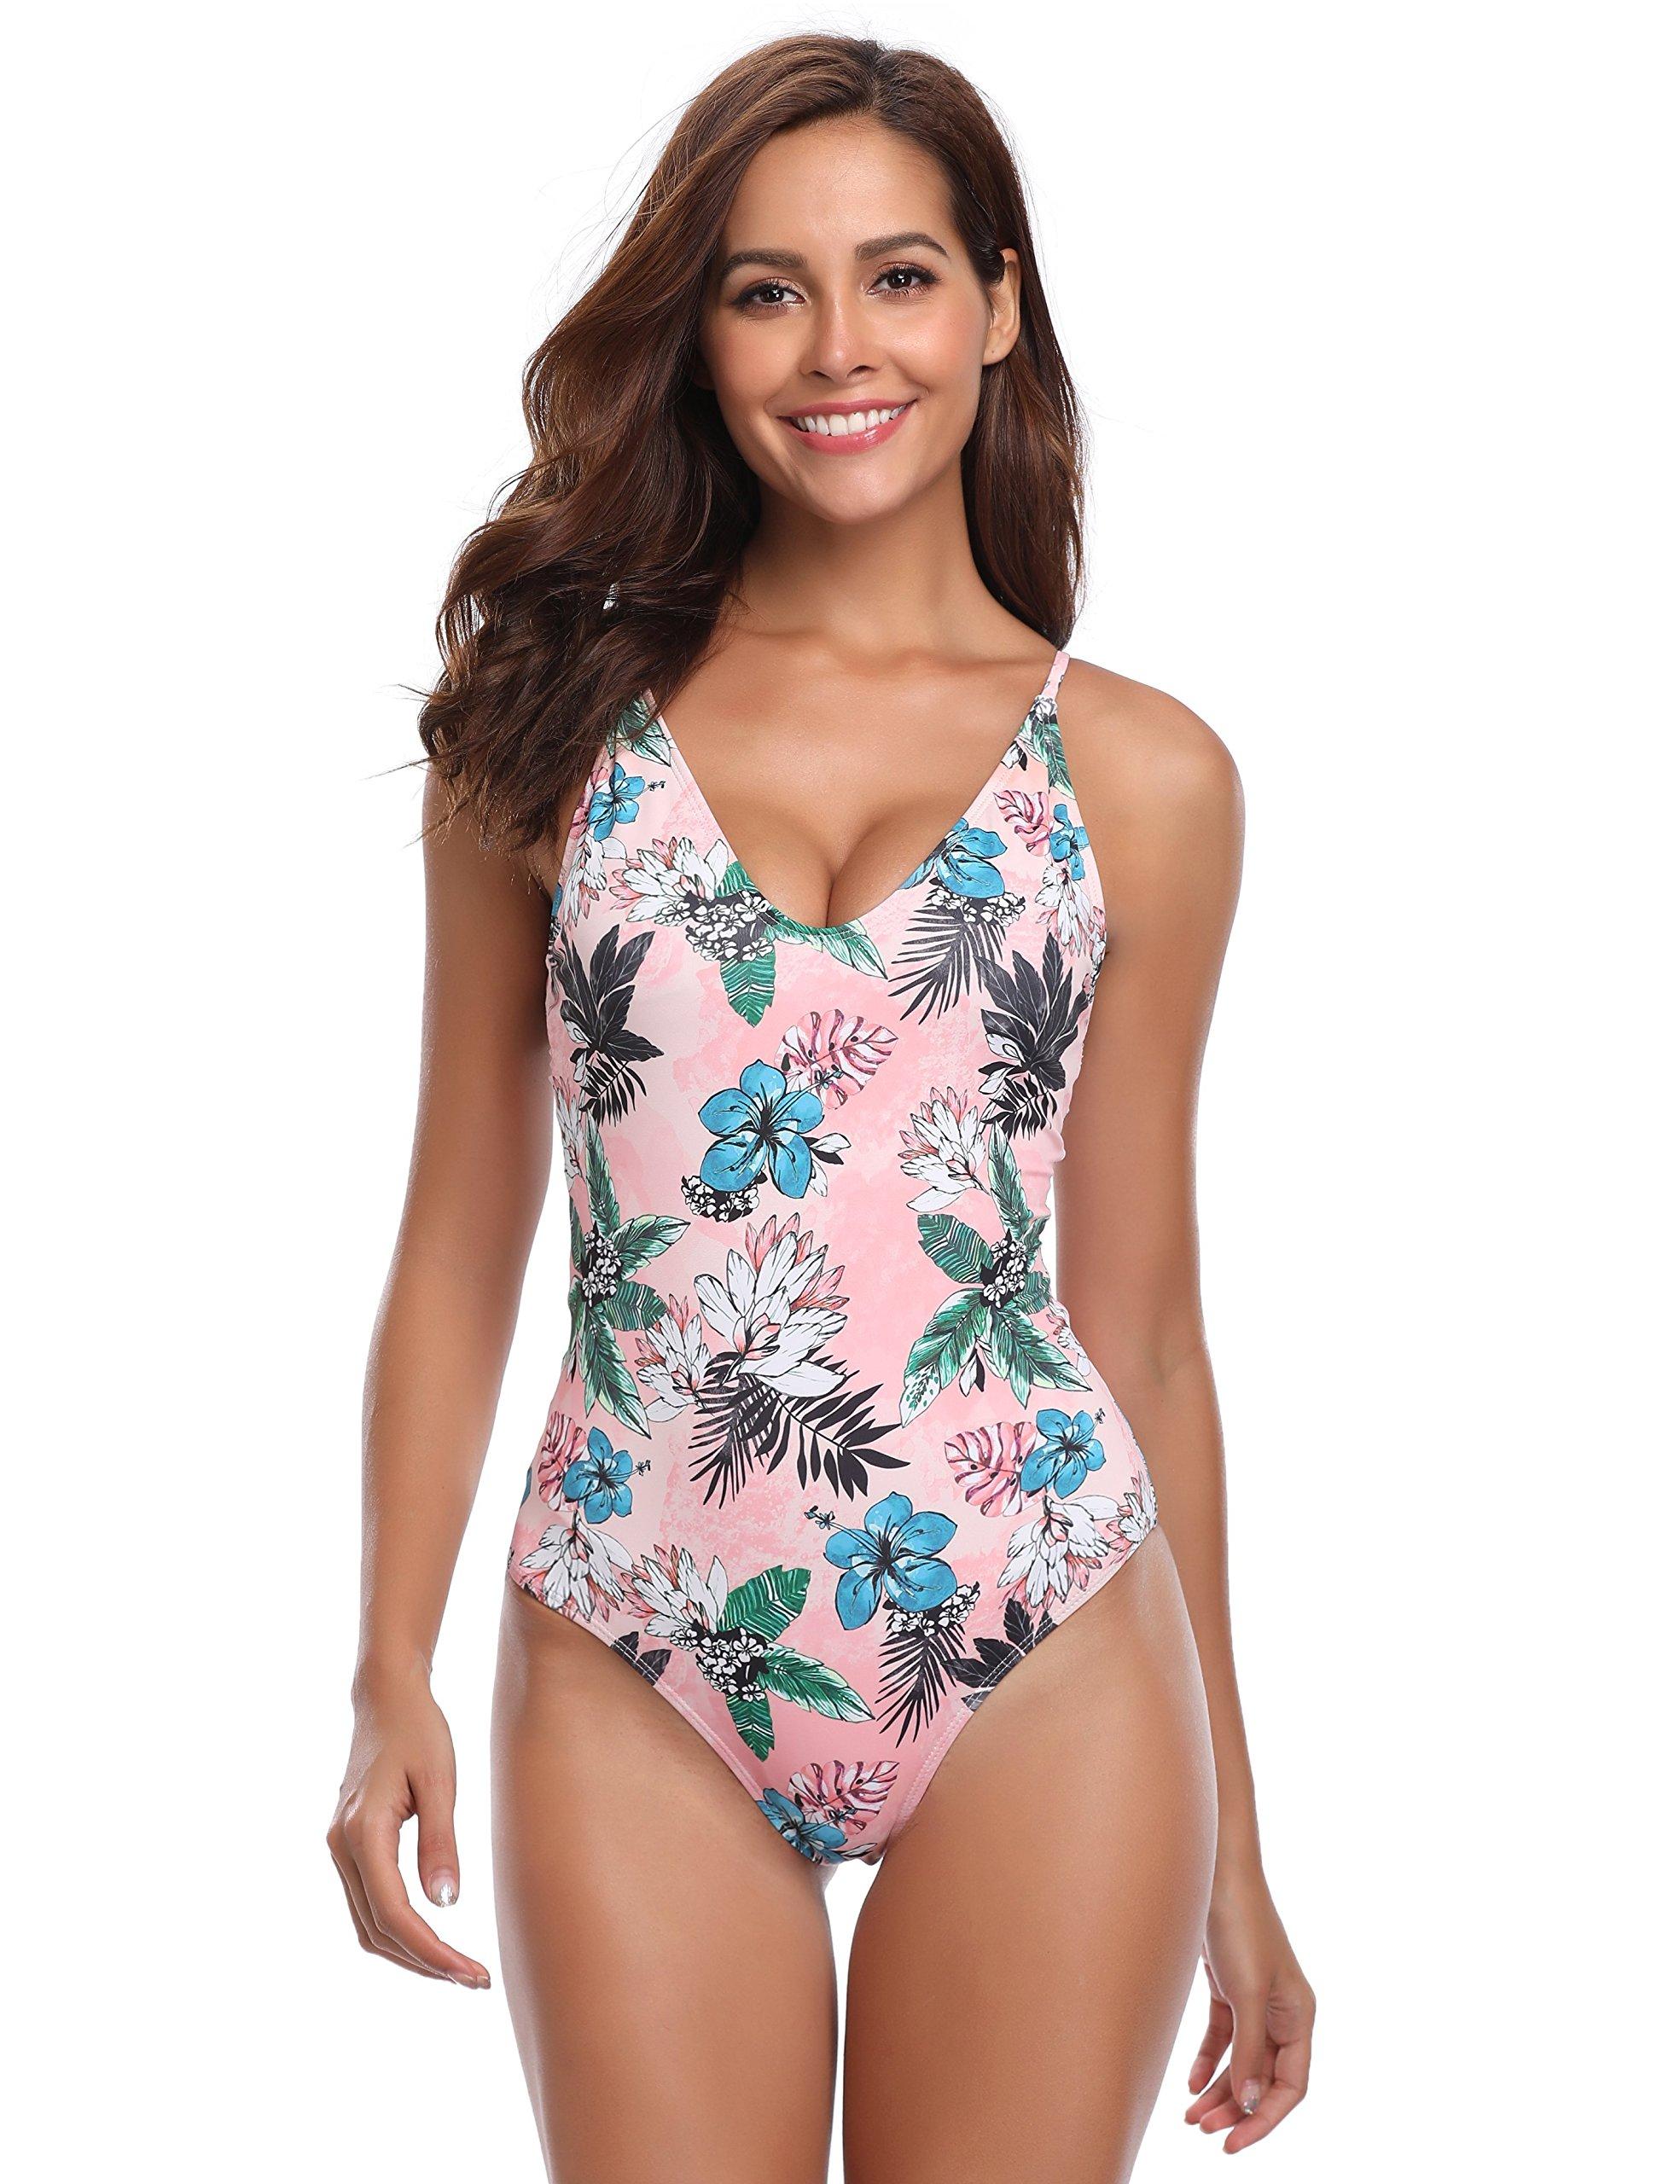 7e3b9502a11 Galleon - MarinaVida Women V-Neck One Piece Swimsuit Floral Print Bathing  Suit